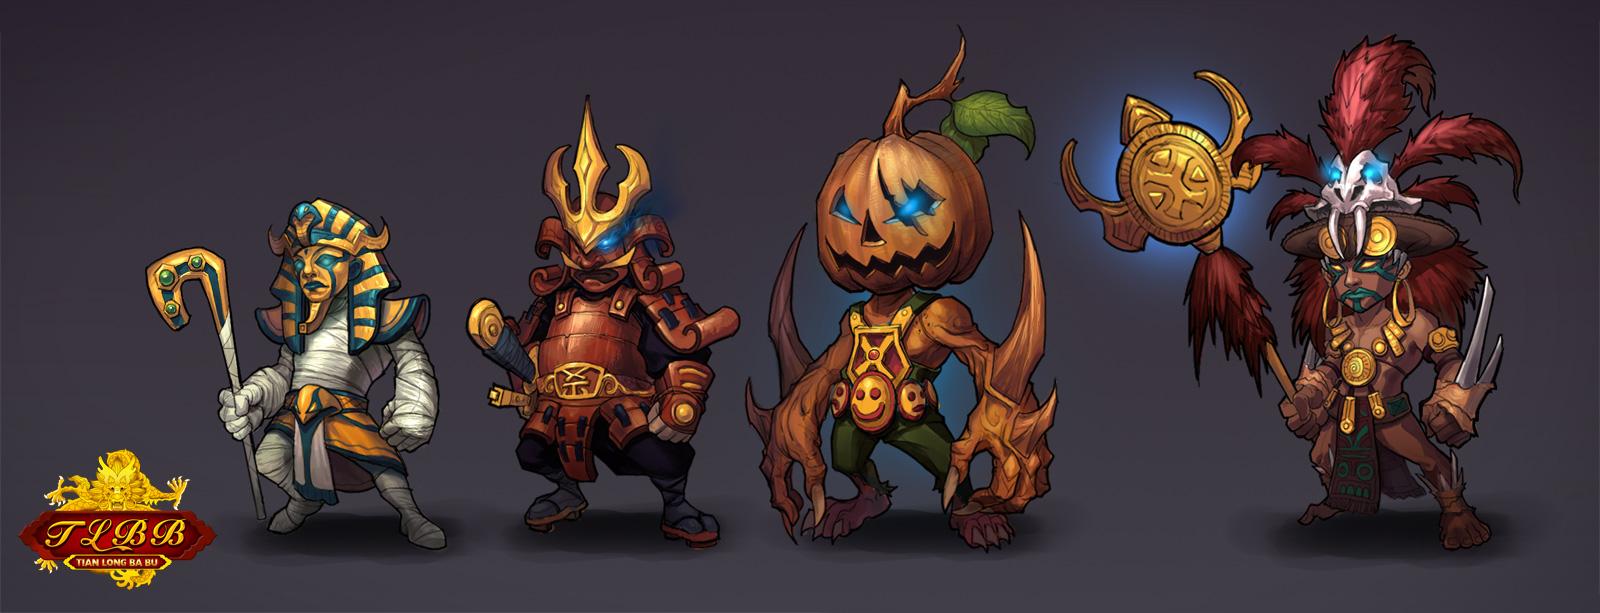 Click image for larger version.Name:halloween-pets-01.jpgViews:364Size:266.0 KBID:1181